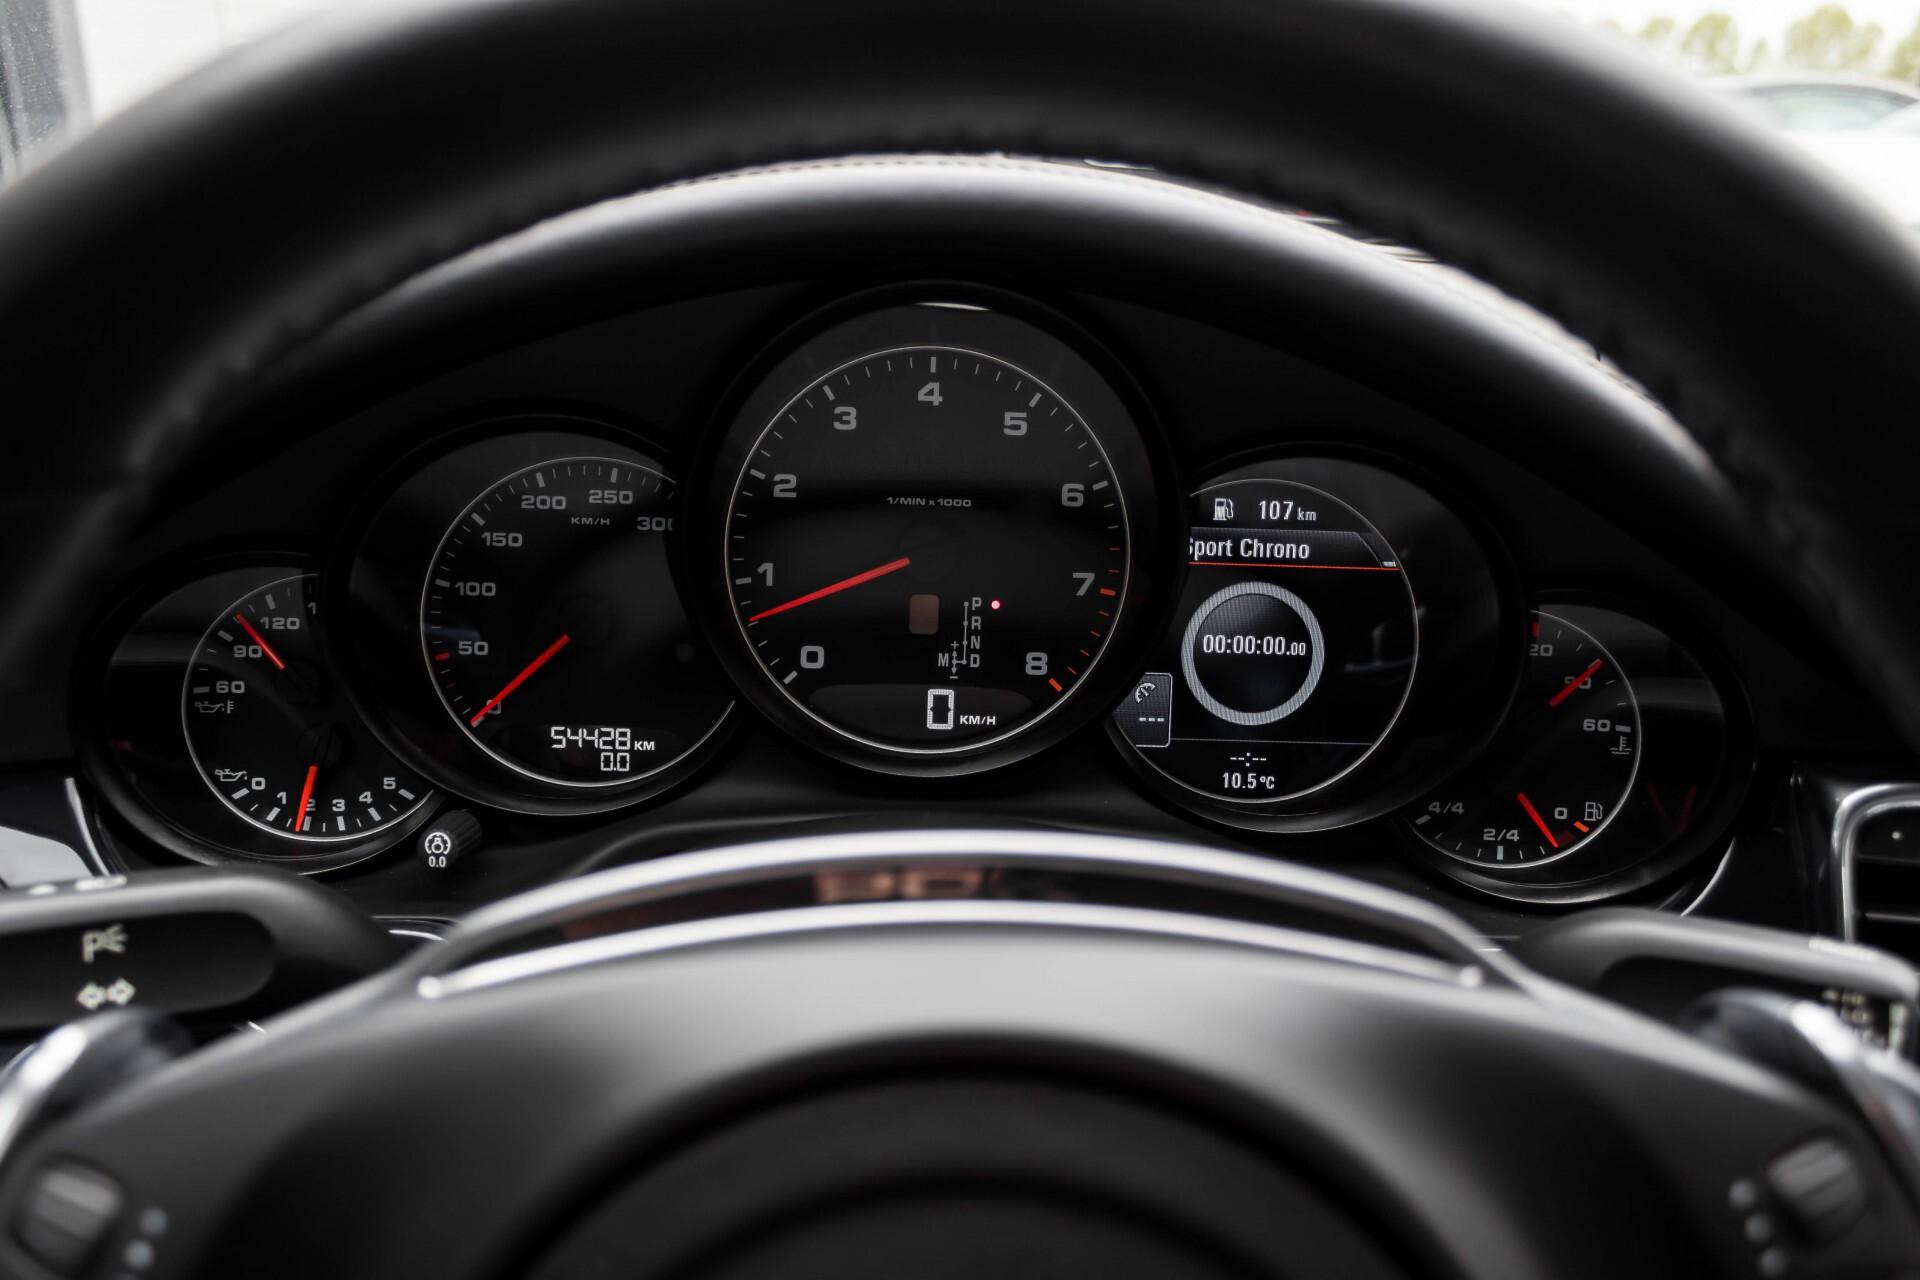 Porsche Panamera 3.6 4 Sportchrono/Luchtvering/Dak/Nappa/Aut7 Foto 13